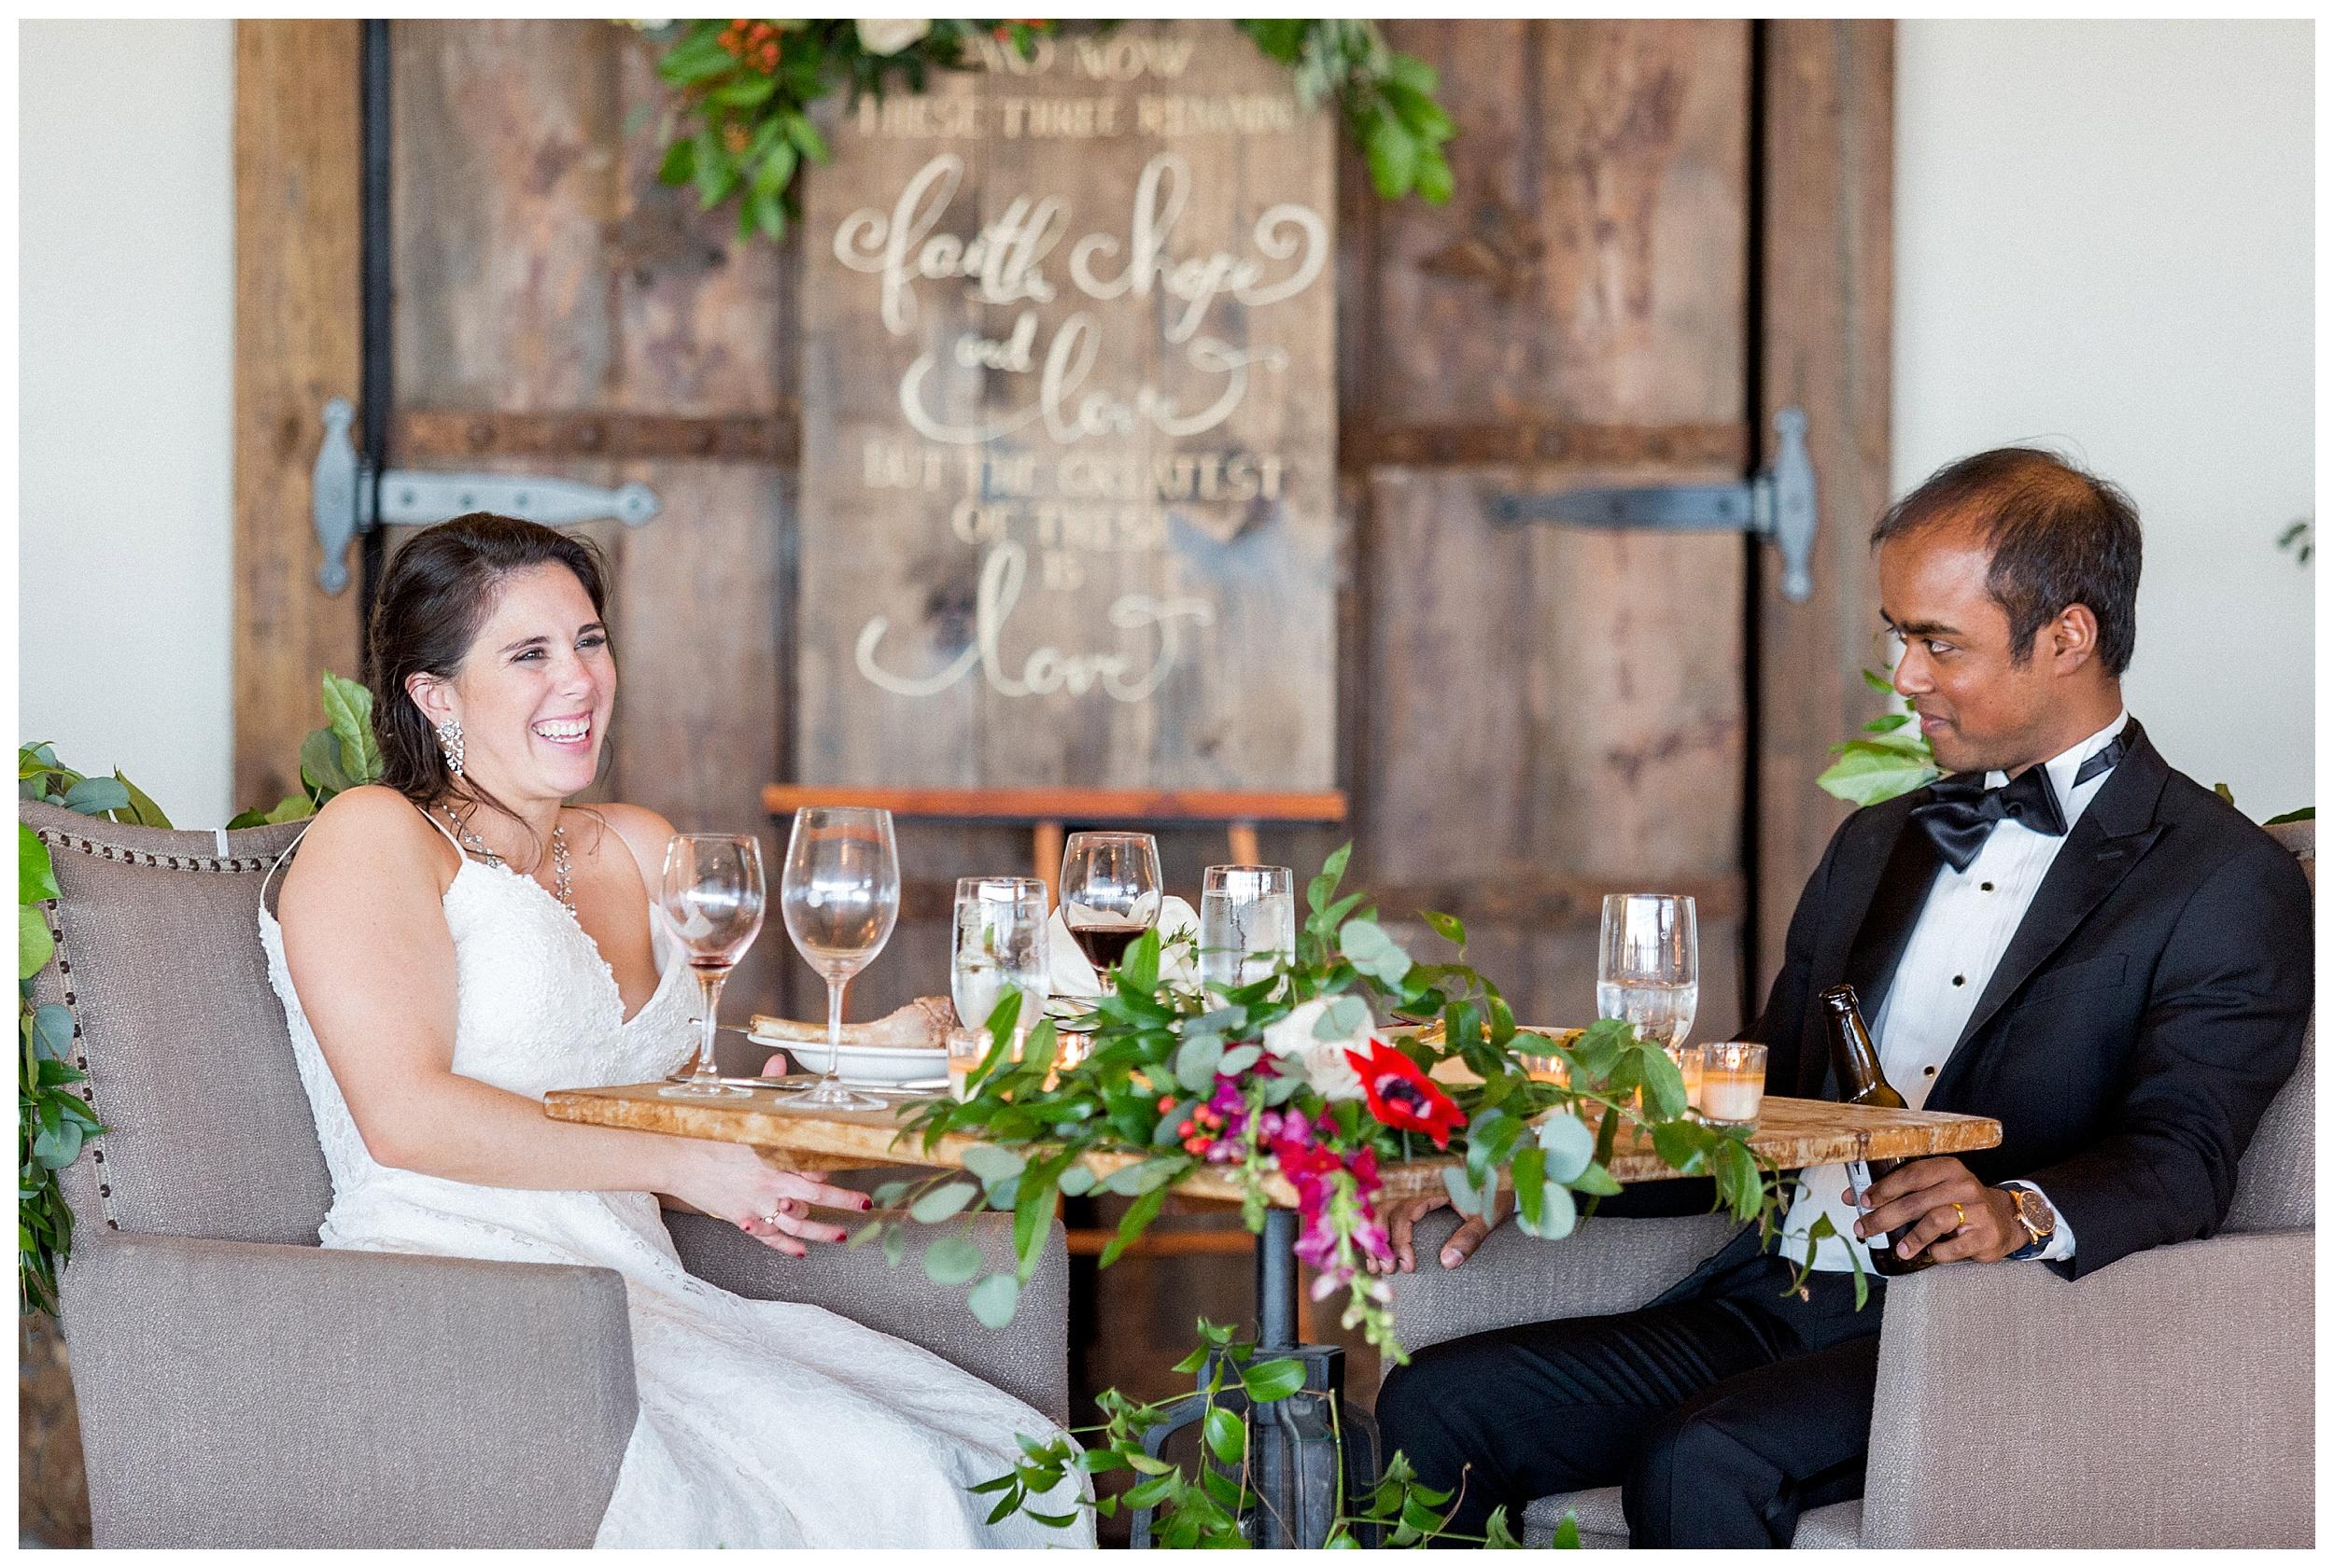 Stone Tower Winery Wedding | Virginia Winter Wedding | VA Wedding Photographer Kir Tuben_0094.jpg